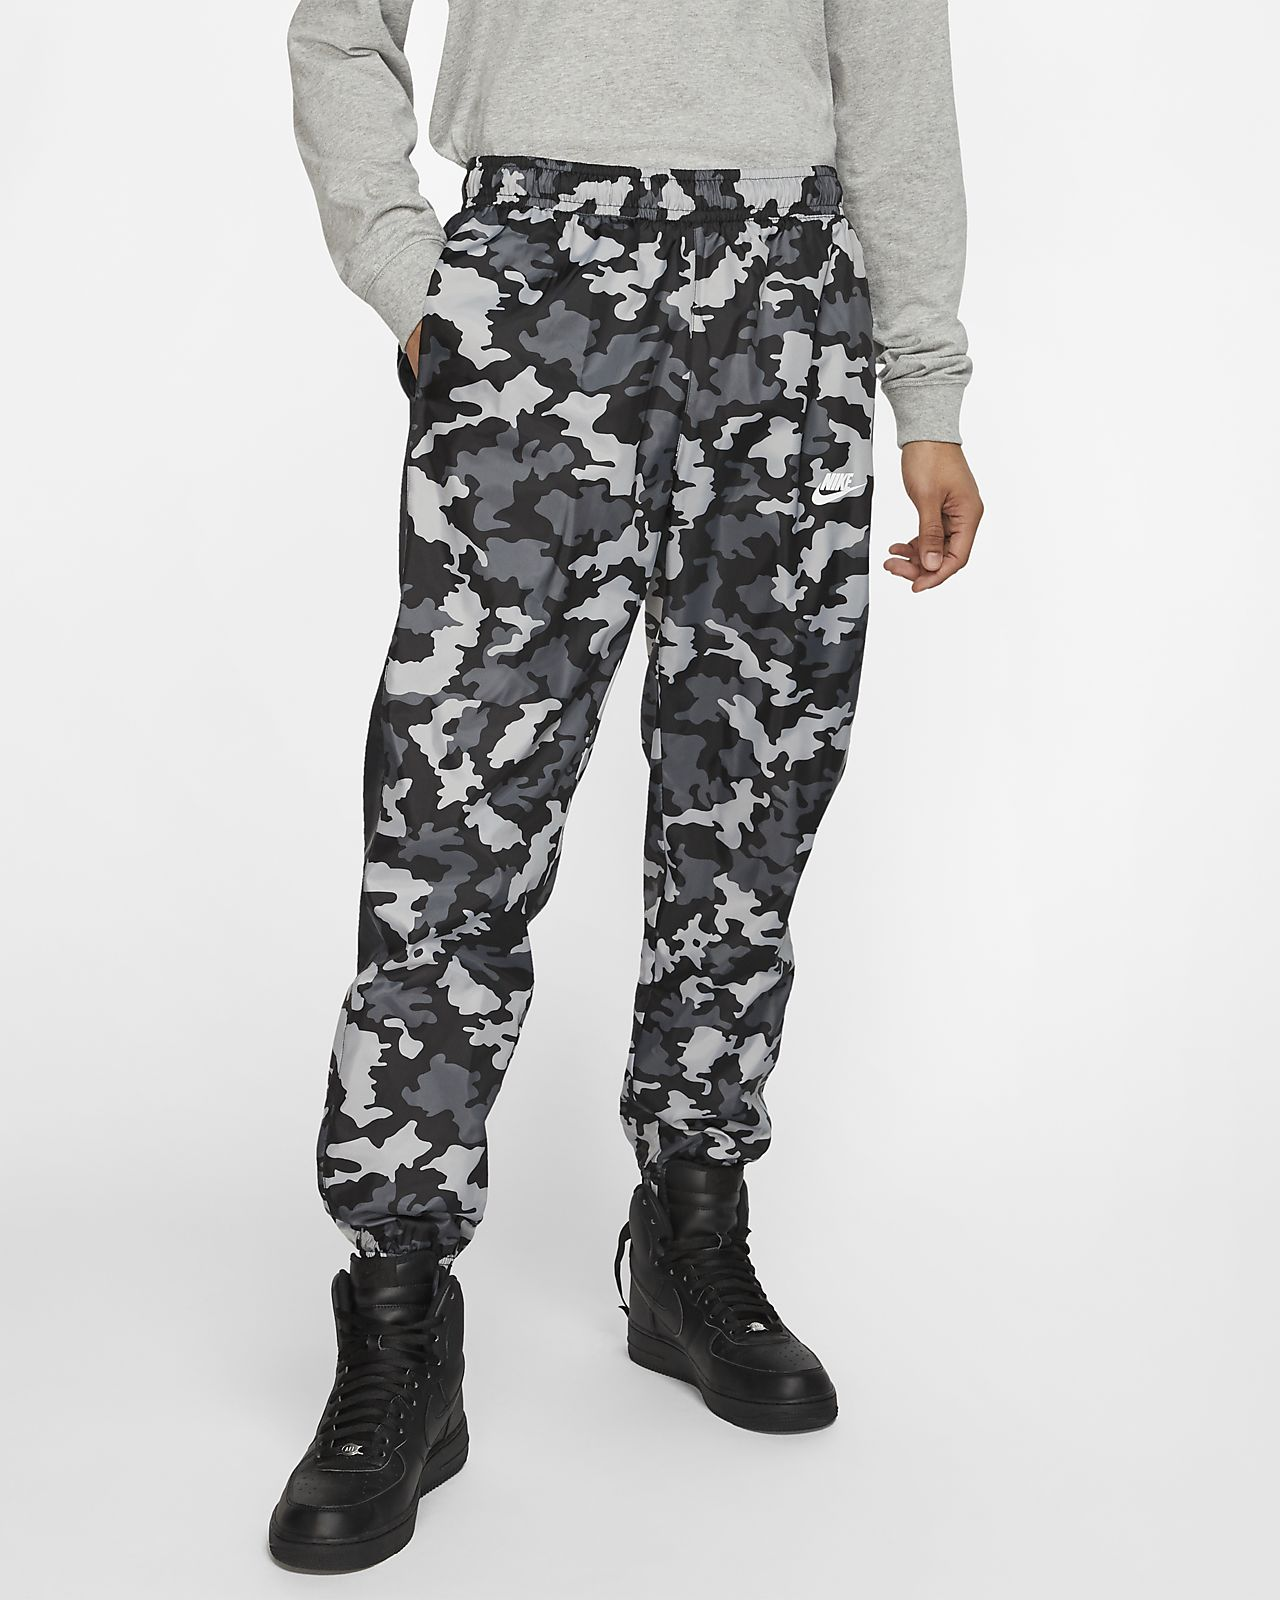 best place finest selection quality design survetement nike camouflage femme